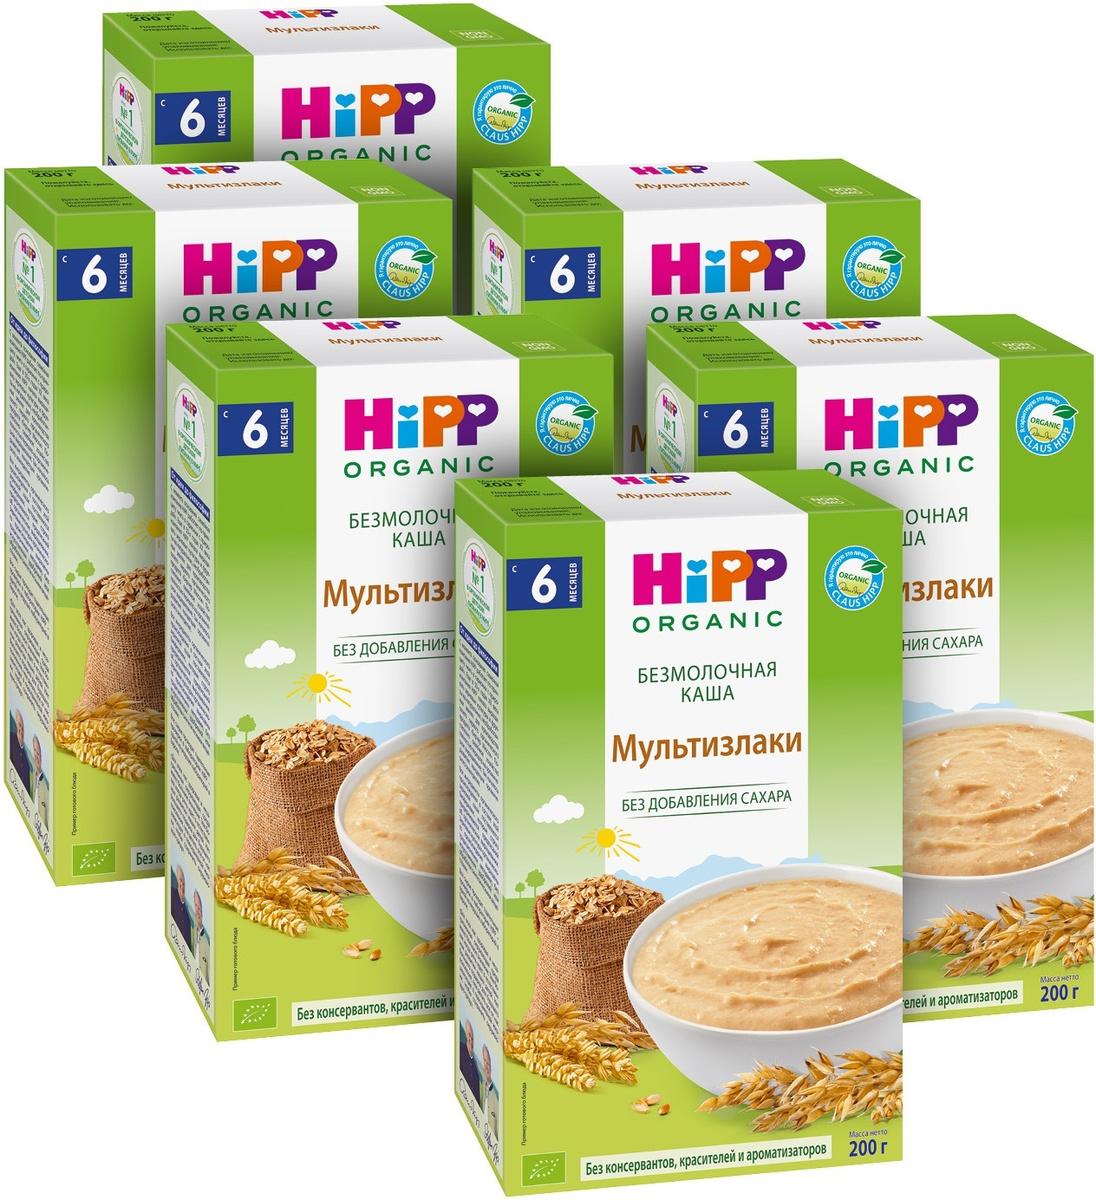 Hipp каша зерновая мультизлаки, 6 месяцев, 6 шт по 200 г #1